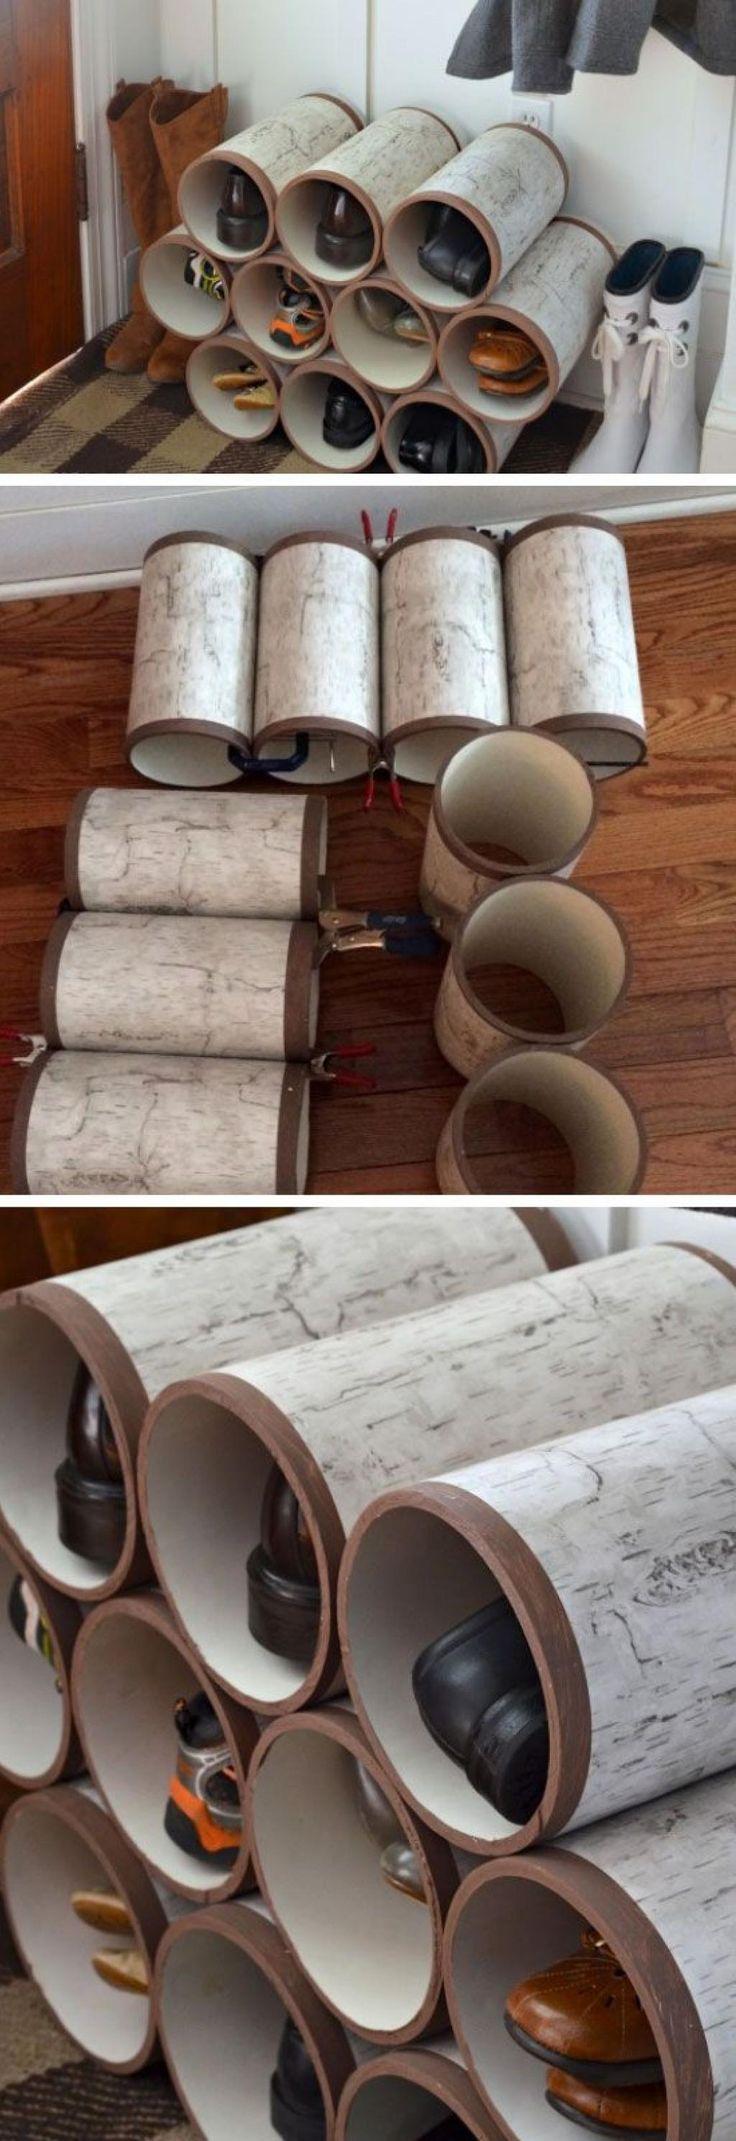 ide rangement chaussures petit espace astuce rangement chaussures ides pour ranger ses. Black Bedroom Furniture Sets. Home Design Ideas